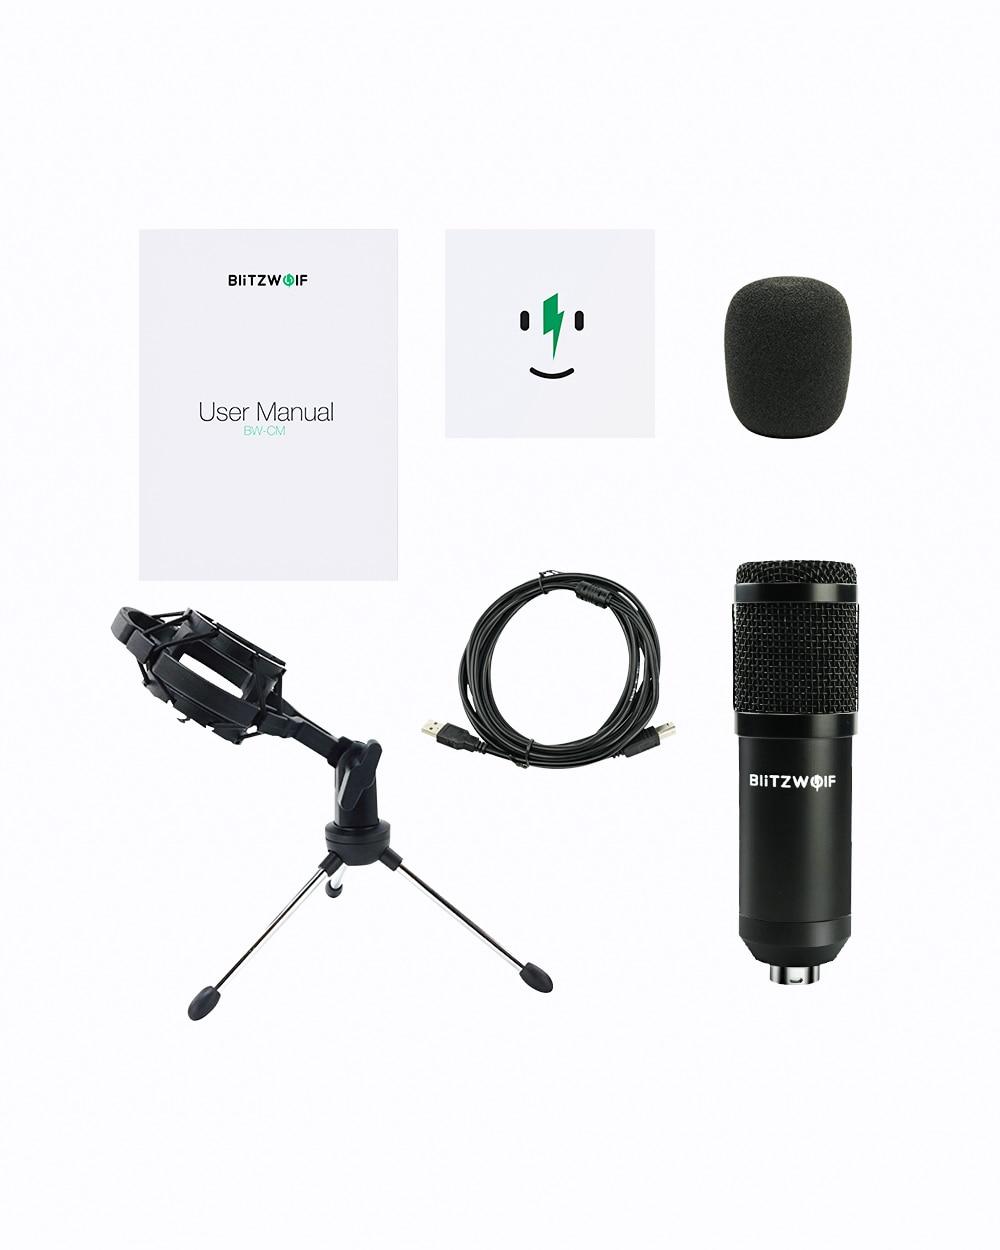 BlitzWolf BW-CM USB 48KHZ/24Bit Condenser Recording Microphone For Laptop Windows Cardioid Studio Recording Vocals Voice Over enlarge